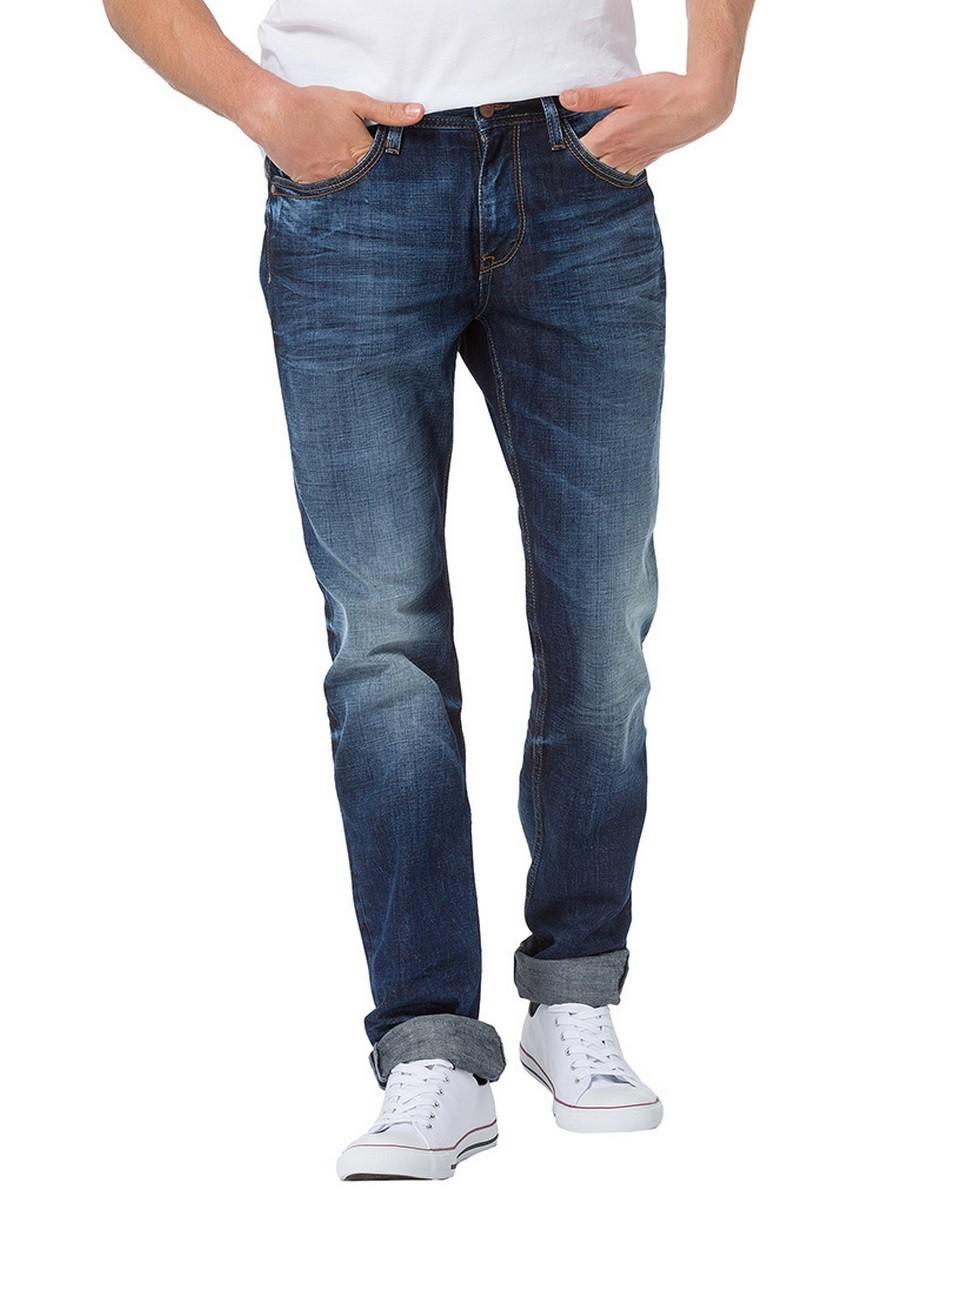 cross herren jeans antonio relax fit blau extreme crincle blue used ebay. Black Bedroom Furniture Sets. Home Design Ideas